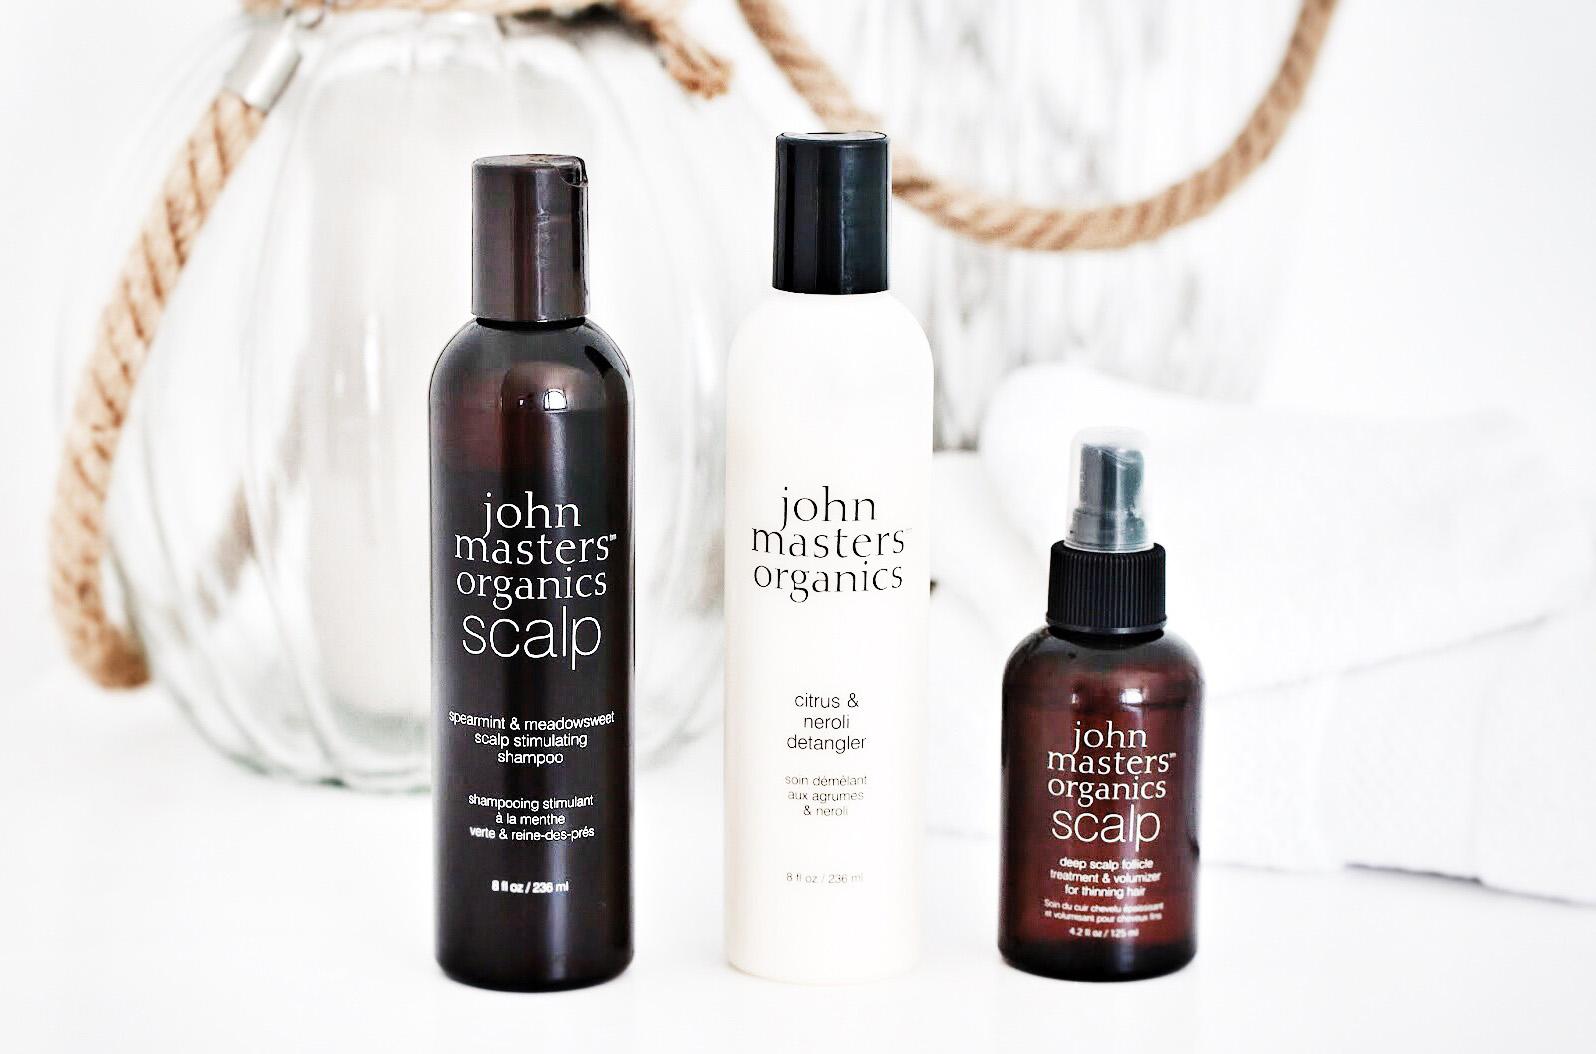 john masters organics rituel stimulant shampooing menthe verte apres shampooing demelant neroli traitement cuir chevelu volume avis test